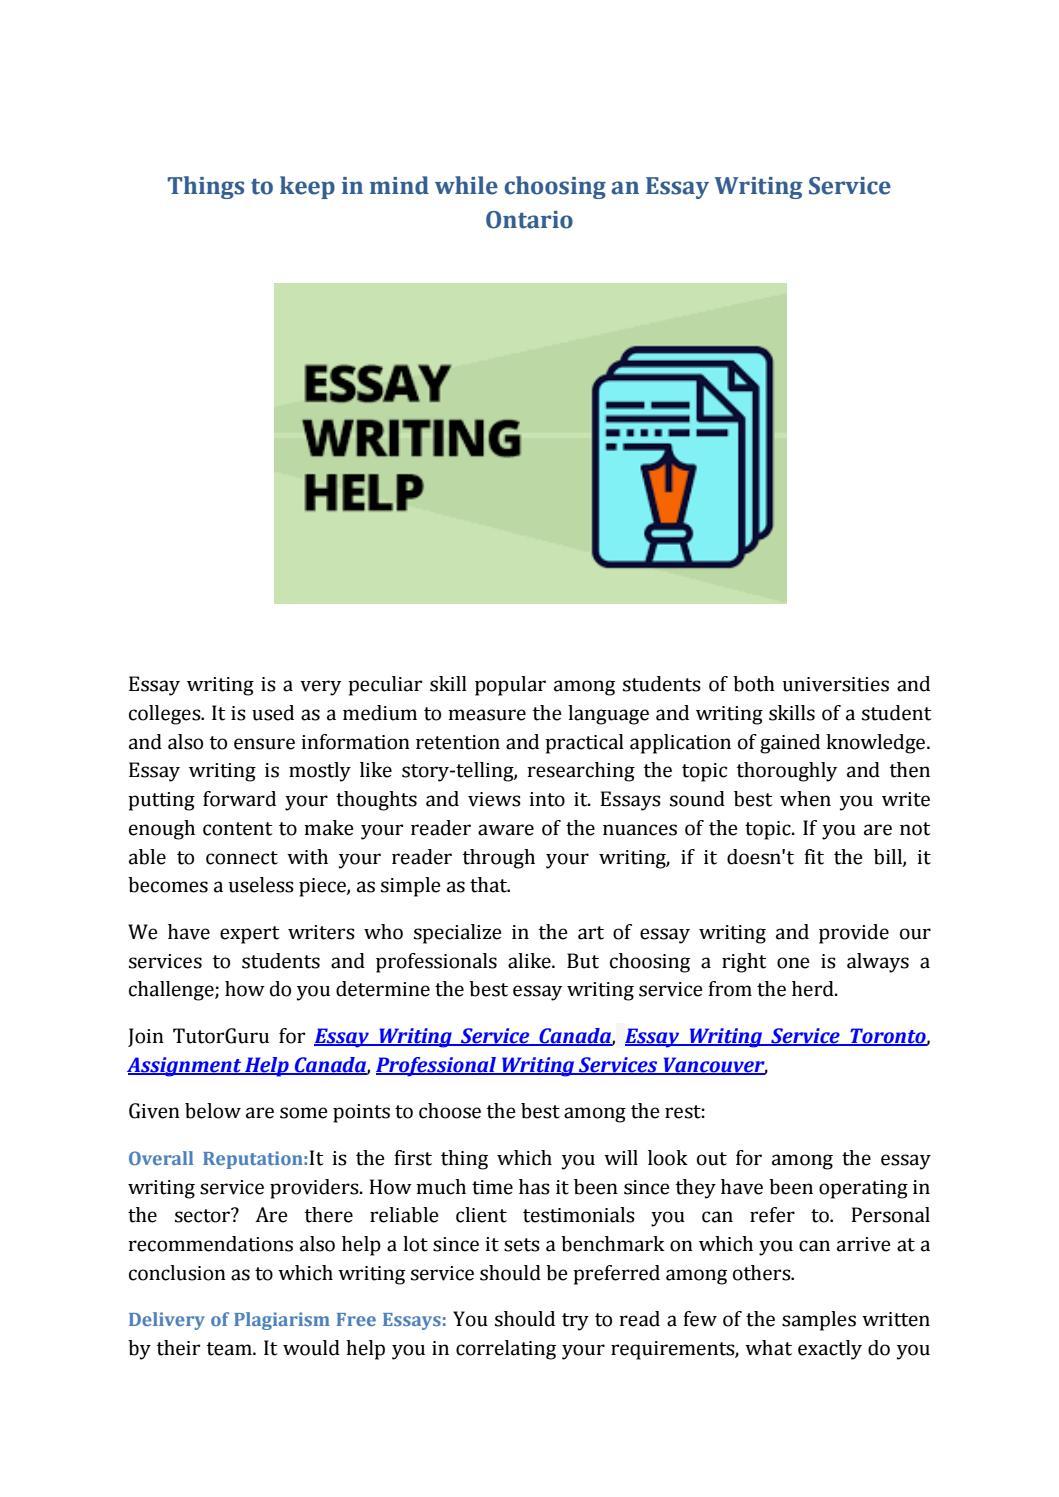 Essay writing service canada quotes in college essays